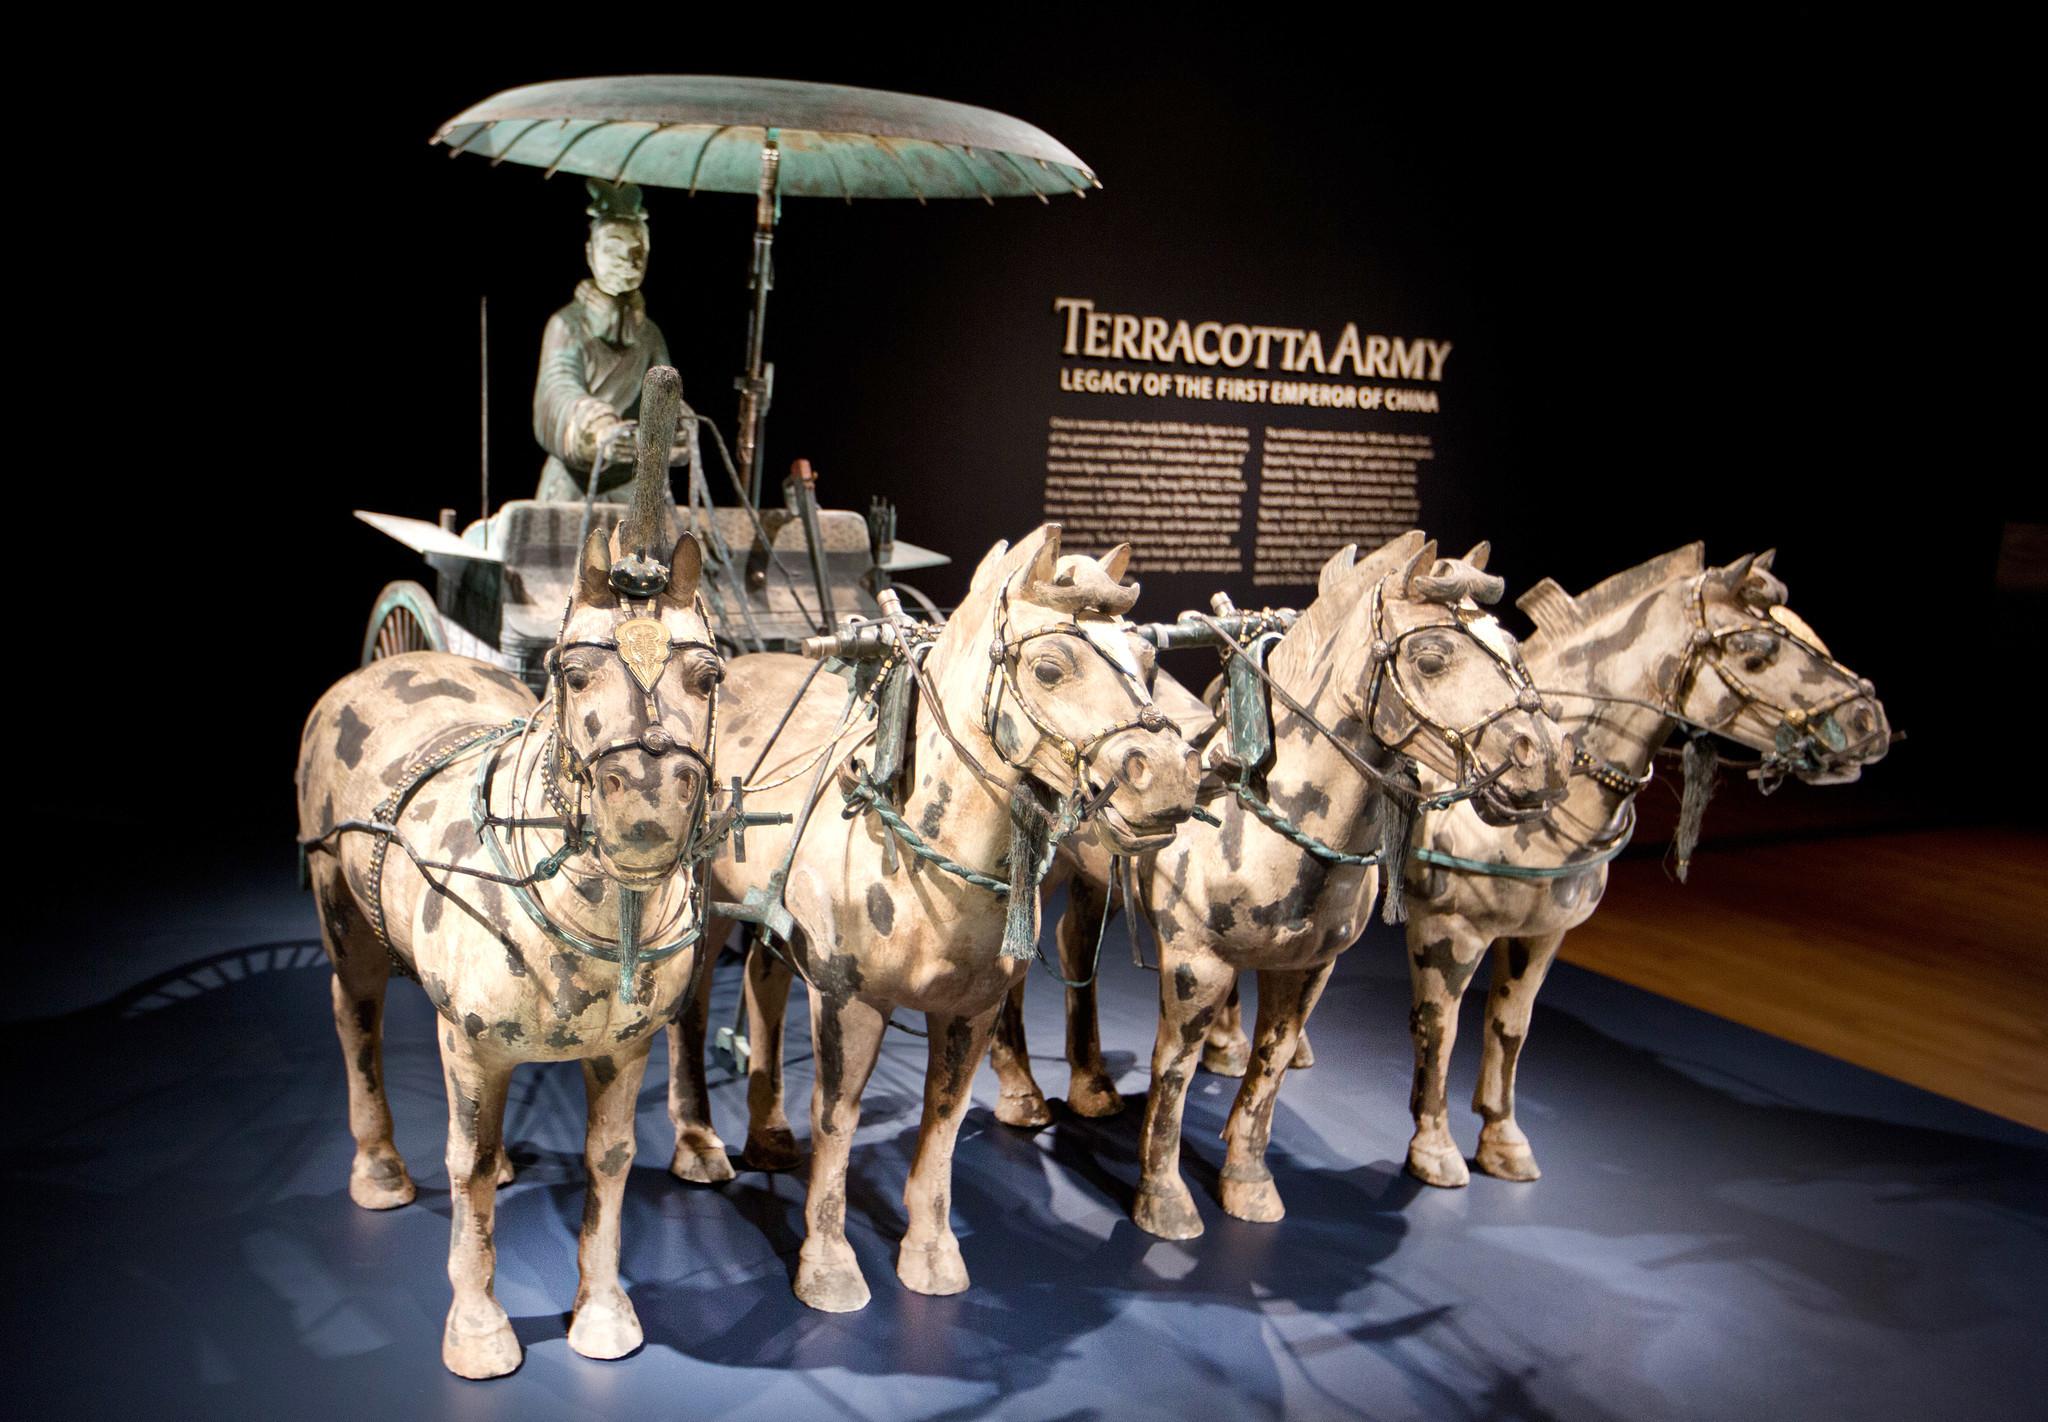 from Reagan terracotta warriors dating methods